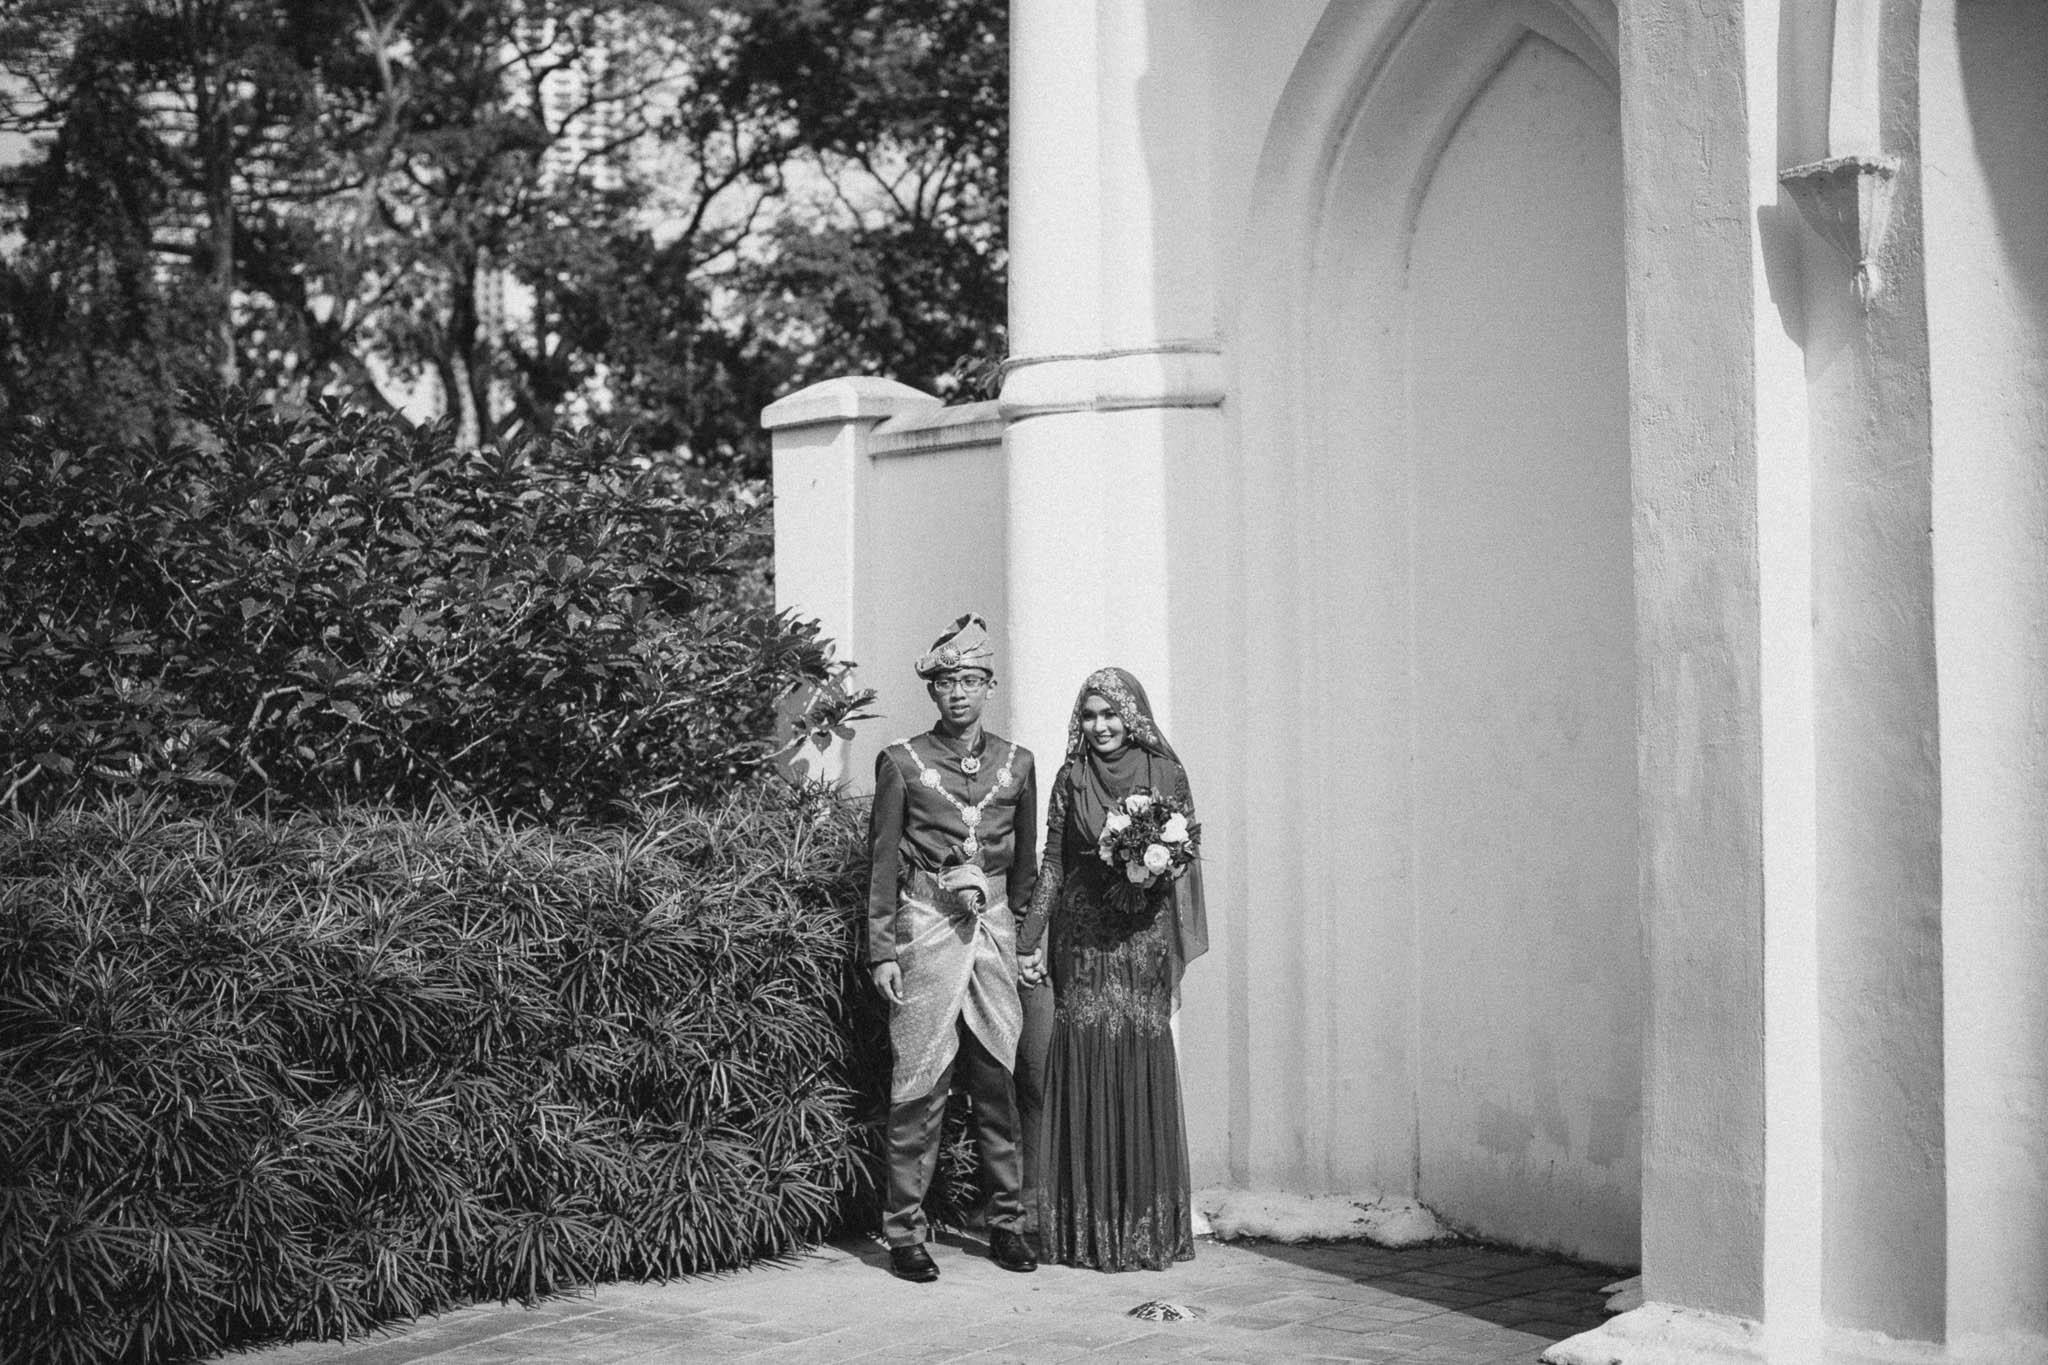 singapore-wedding-photographer-sharalyn-syazwan-072.jpg